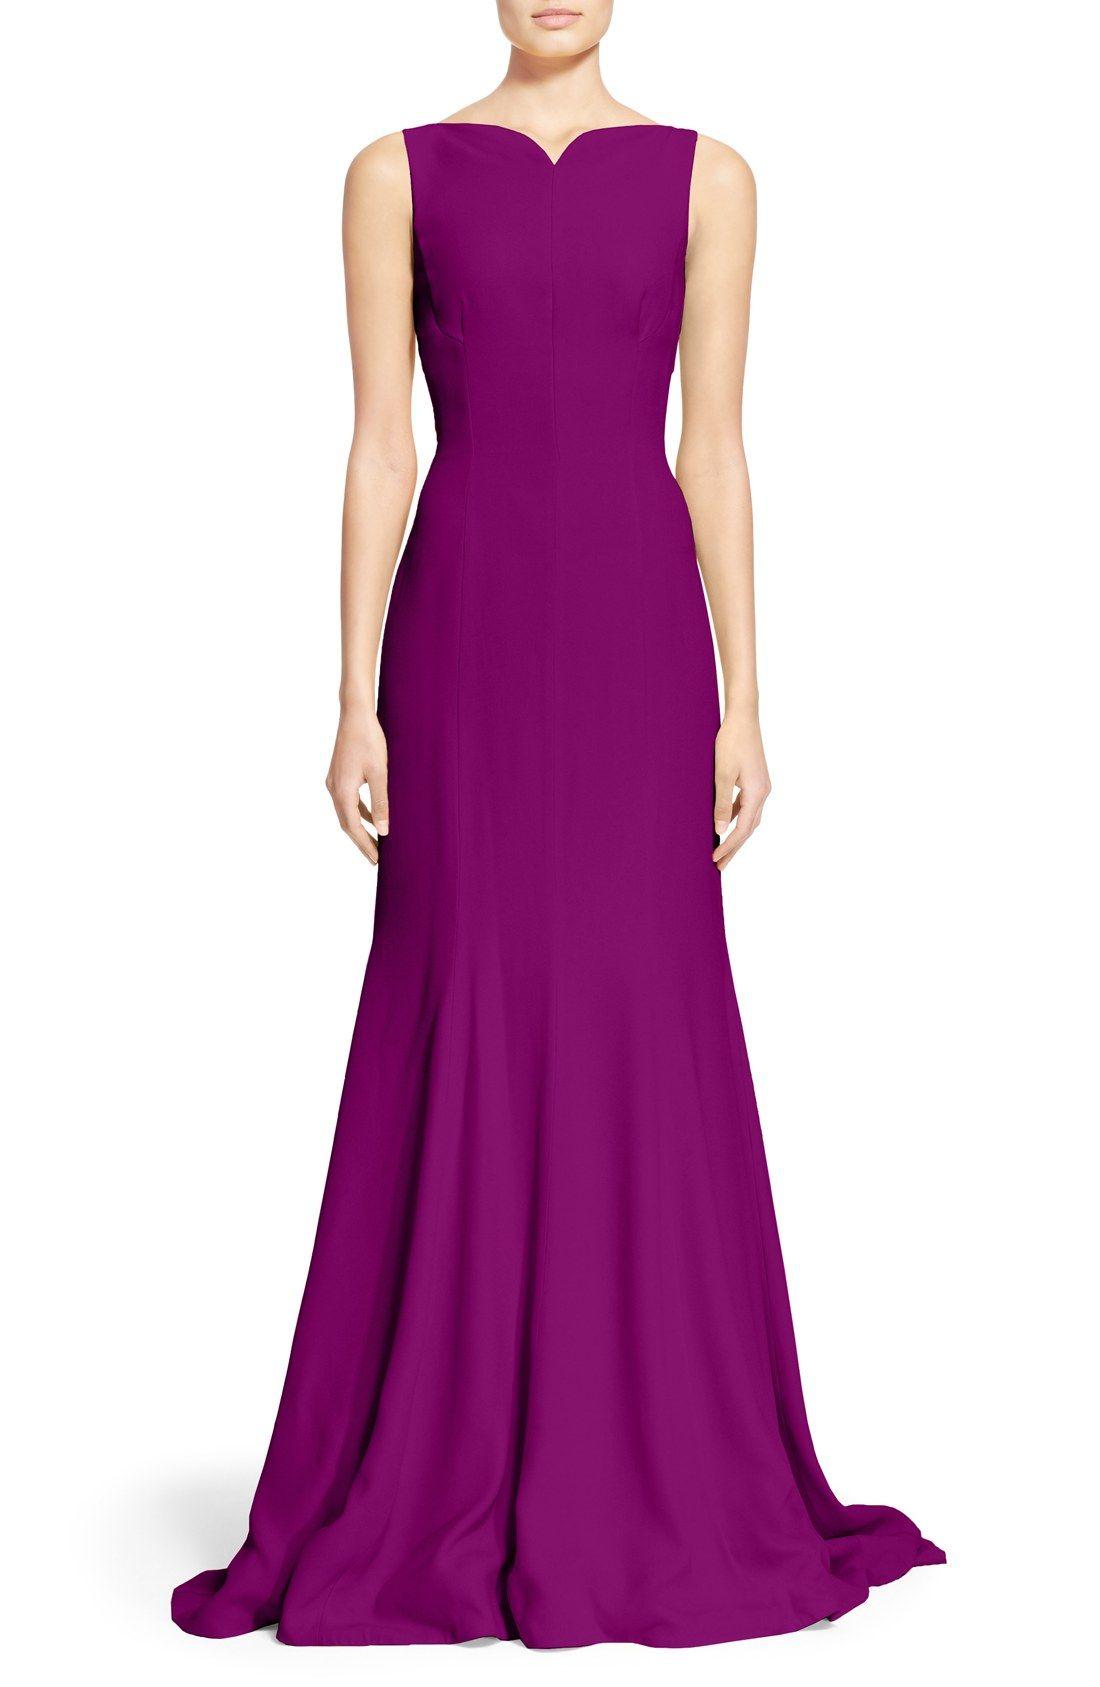 Oscar de la Renta Sleeveless Satin Crepe Gown | Vestidos | Pinterest ...